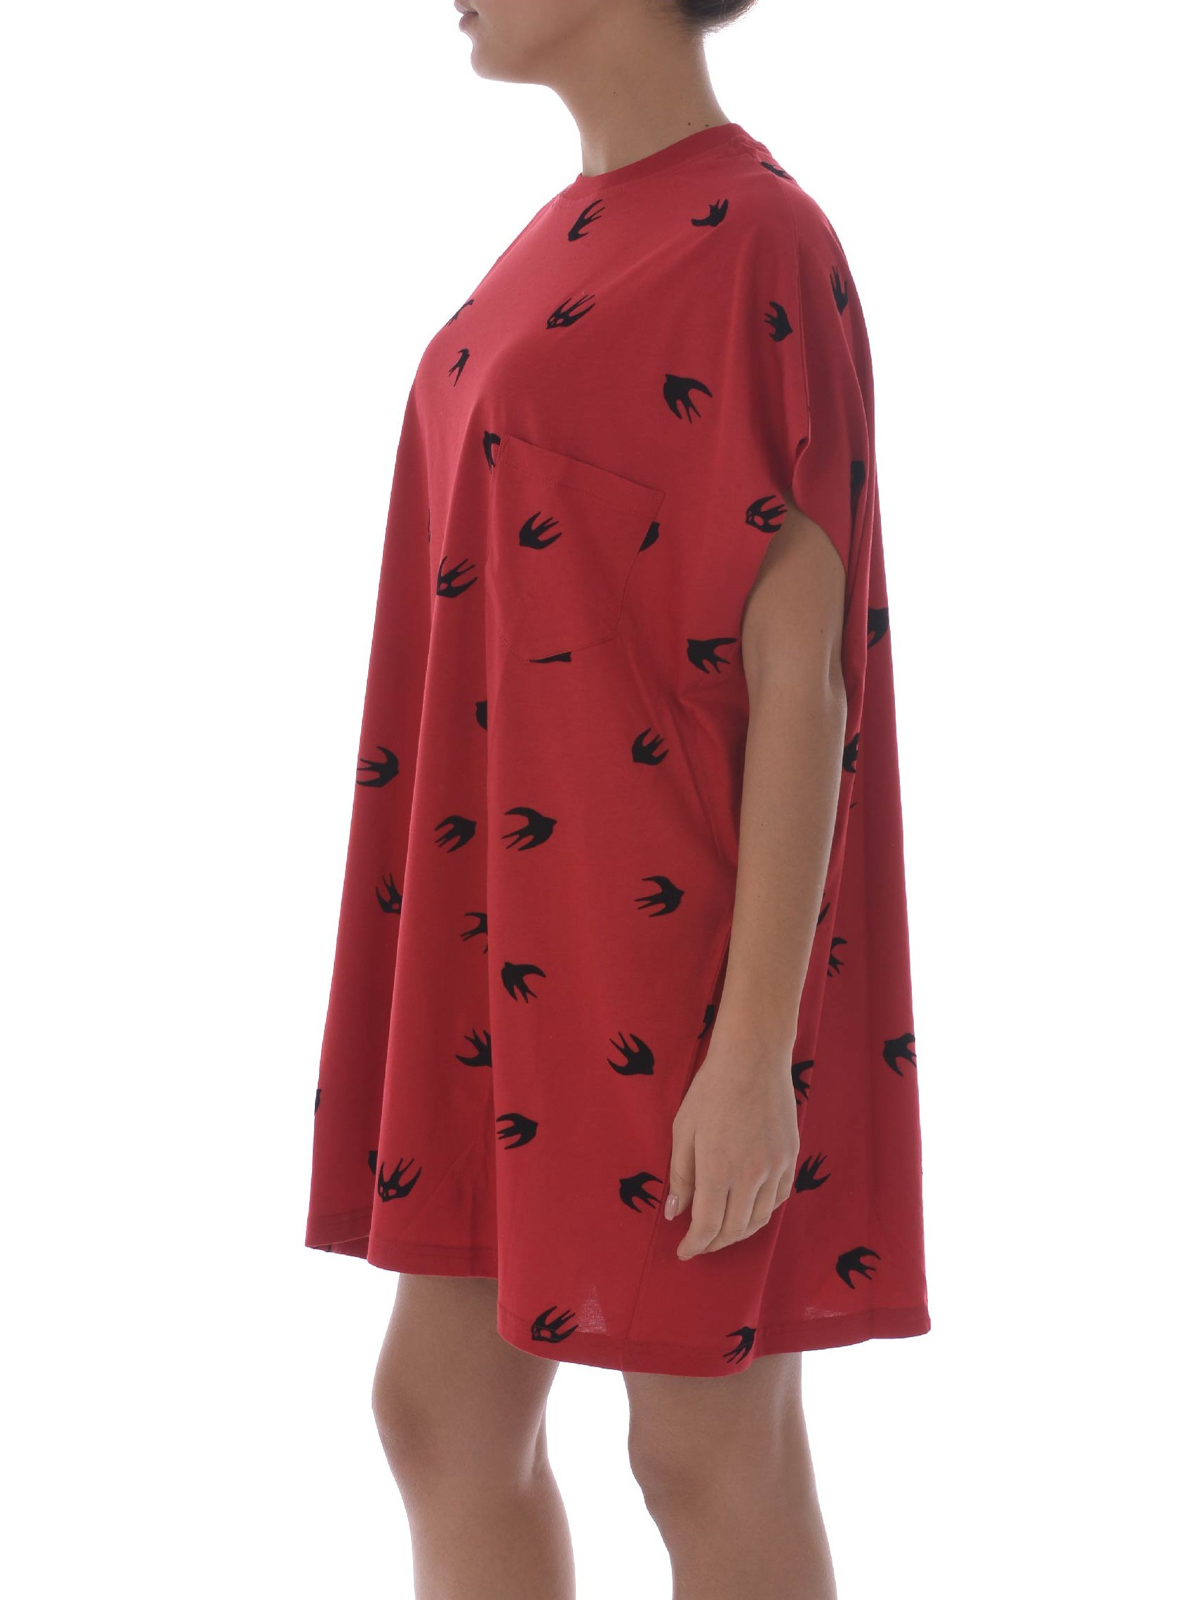 Mcq   Kurzes Kleid   Rot   Kurze Kleider   9RIT9   iKRIX.com